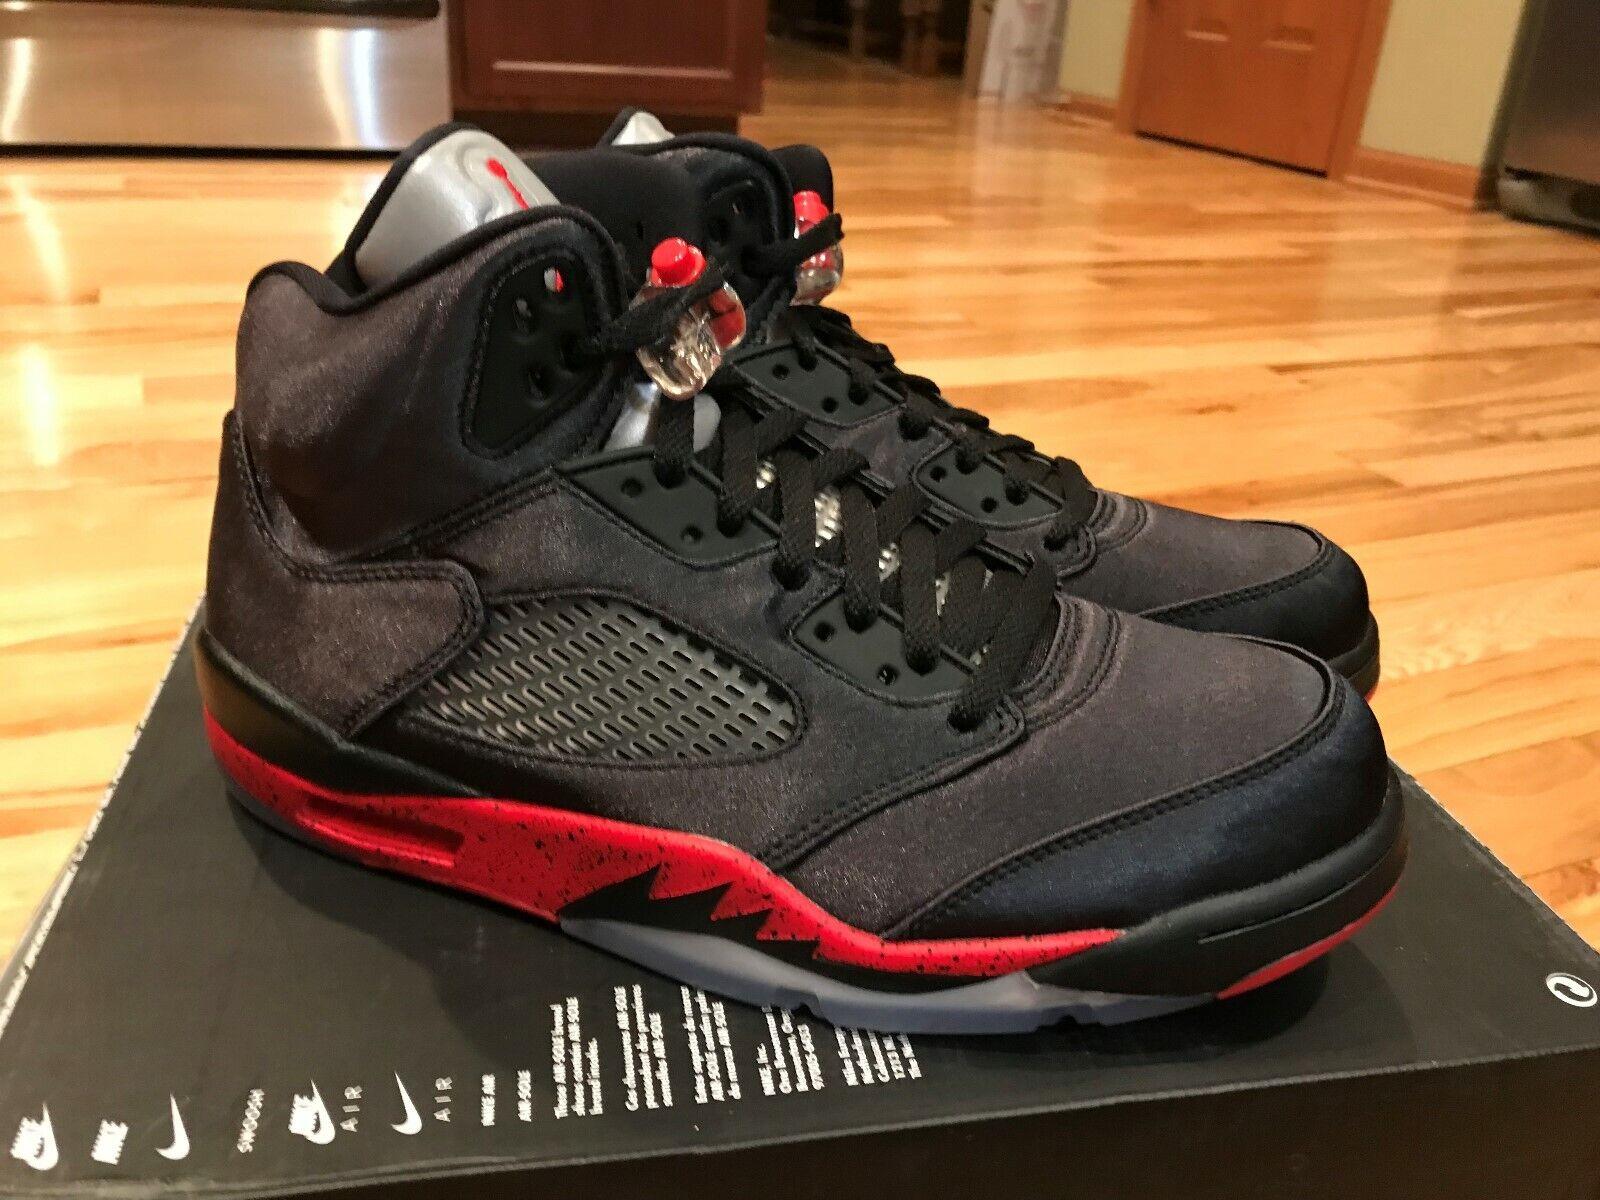 Nike Air Jordan 5 Retro Satin Bred Black Red 136027 006 Men's Size 12